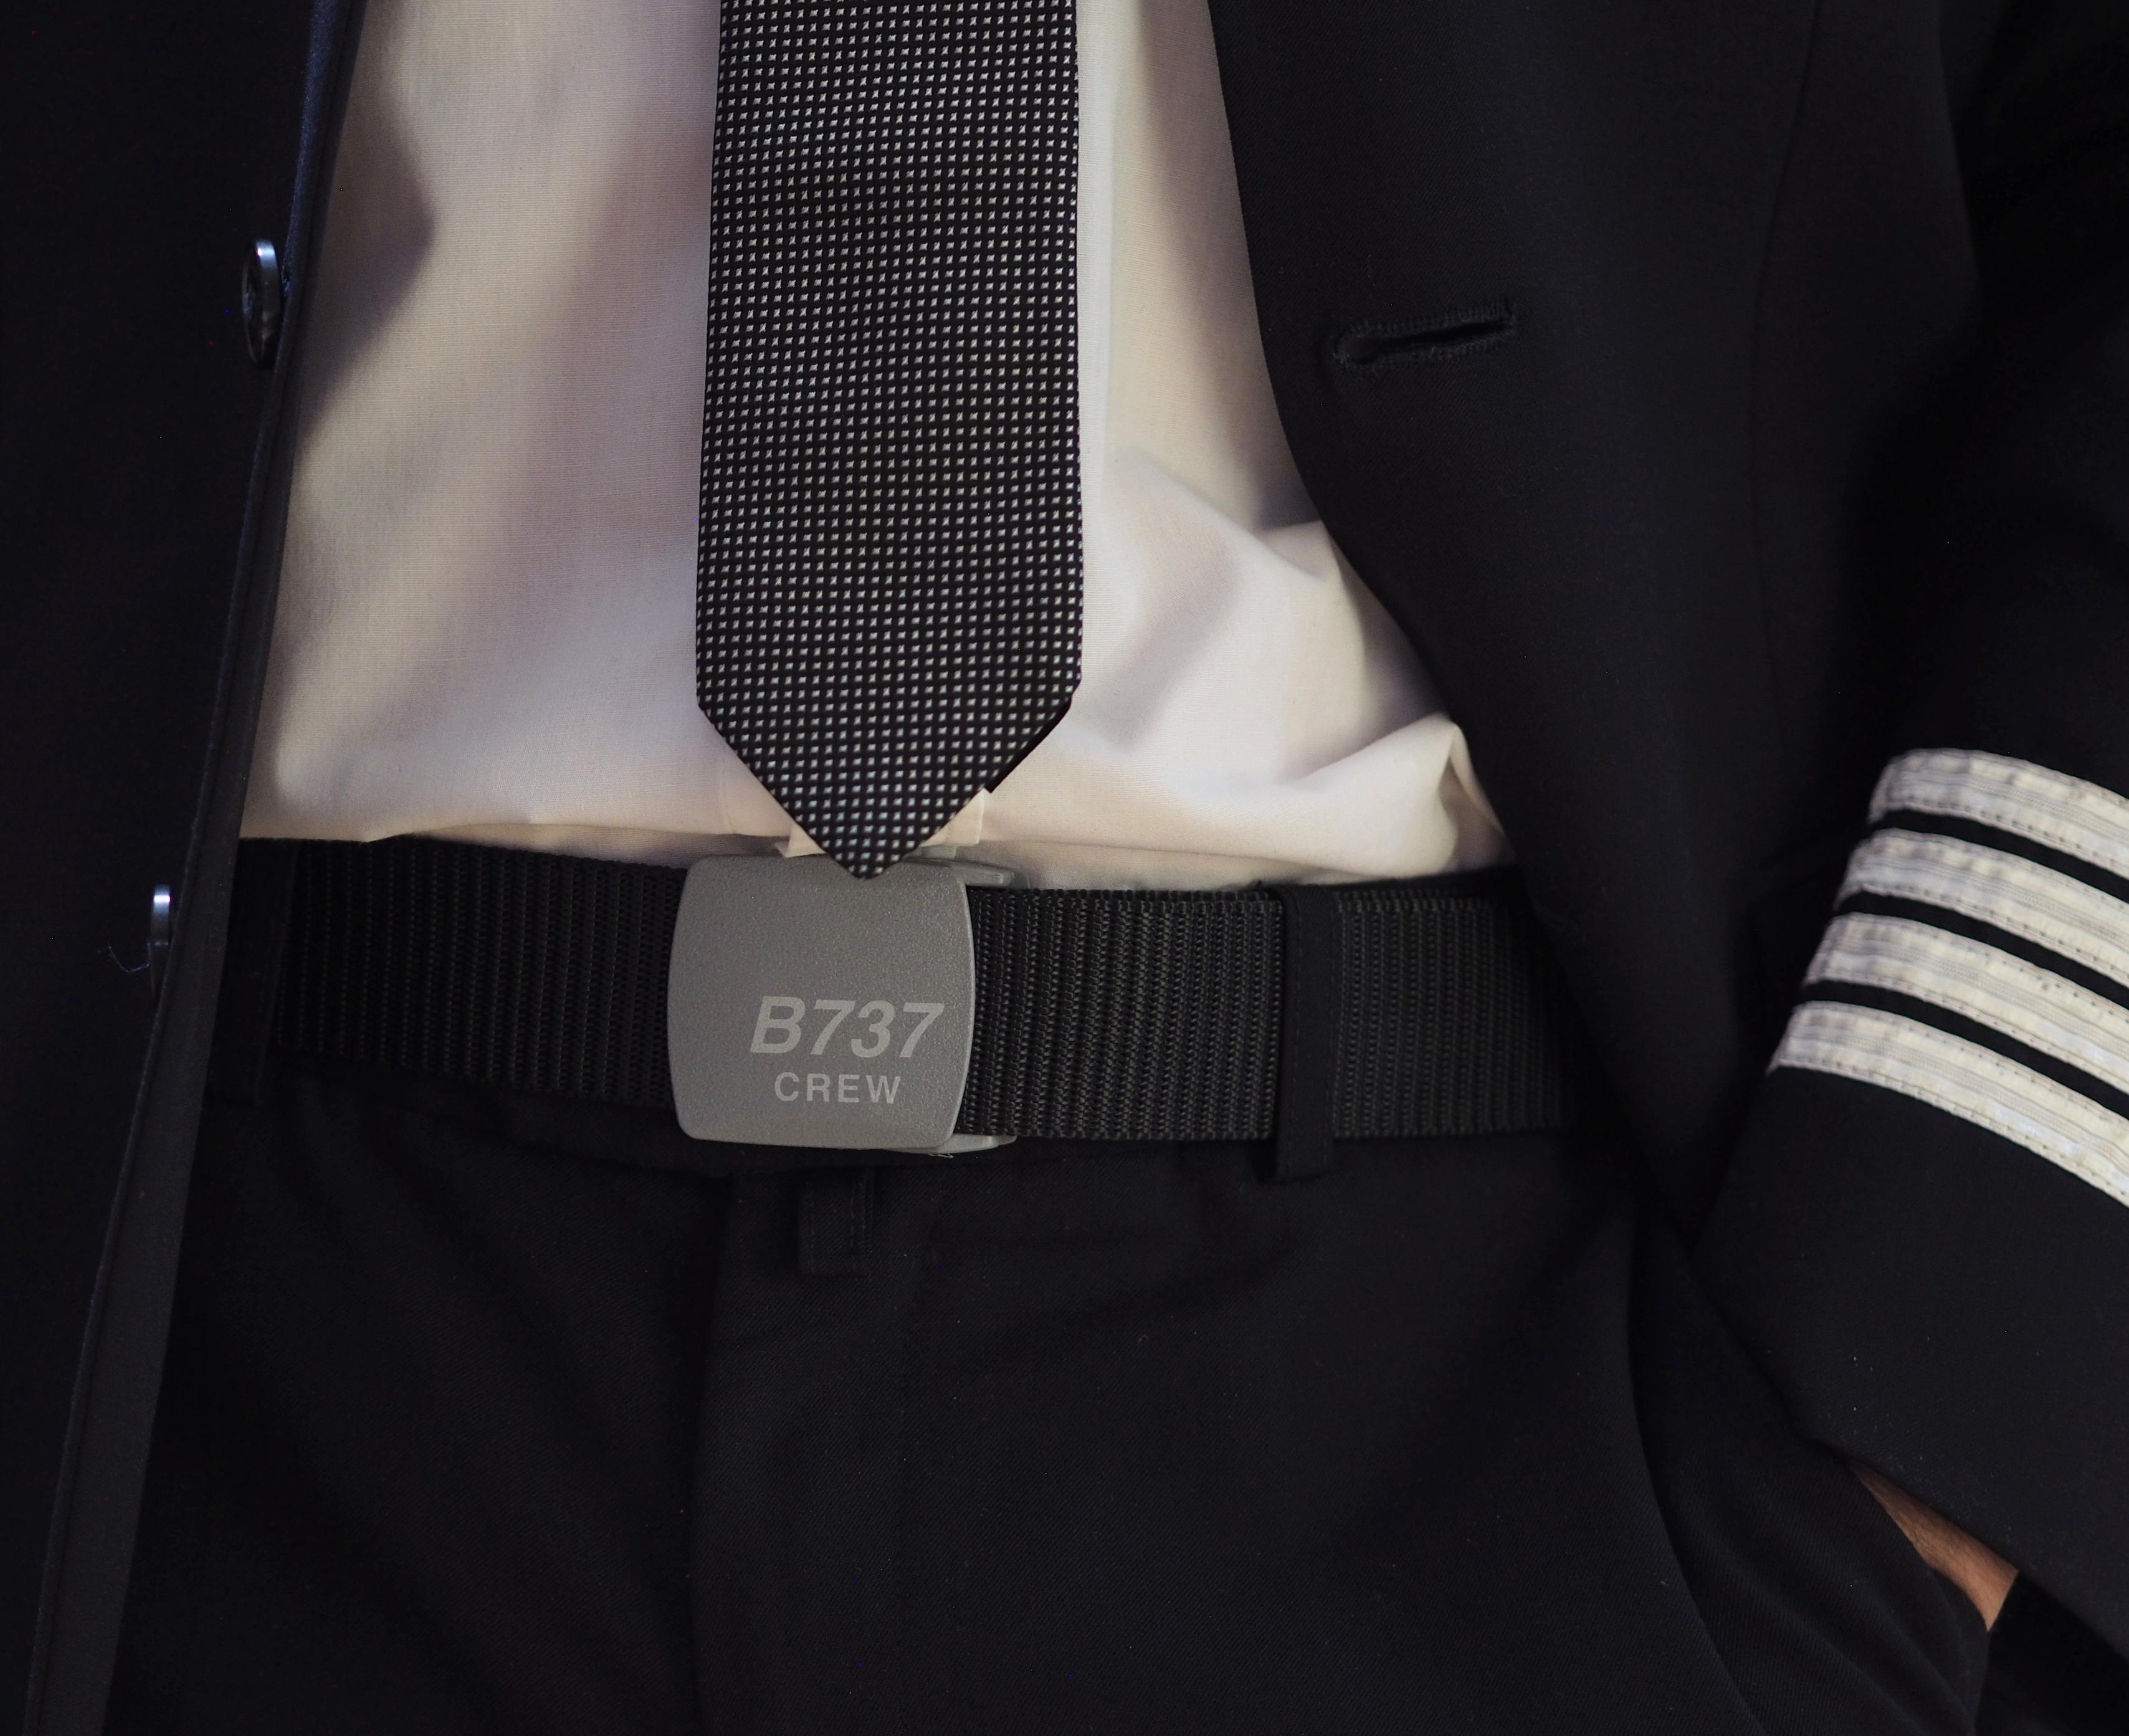 B737 Crew Belt with plastic buckle